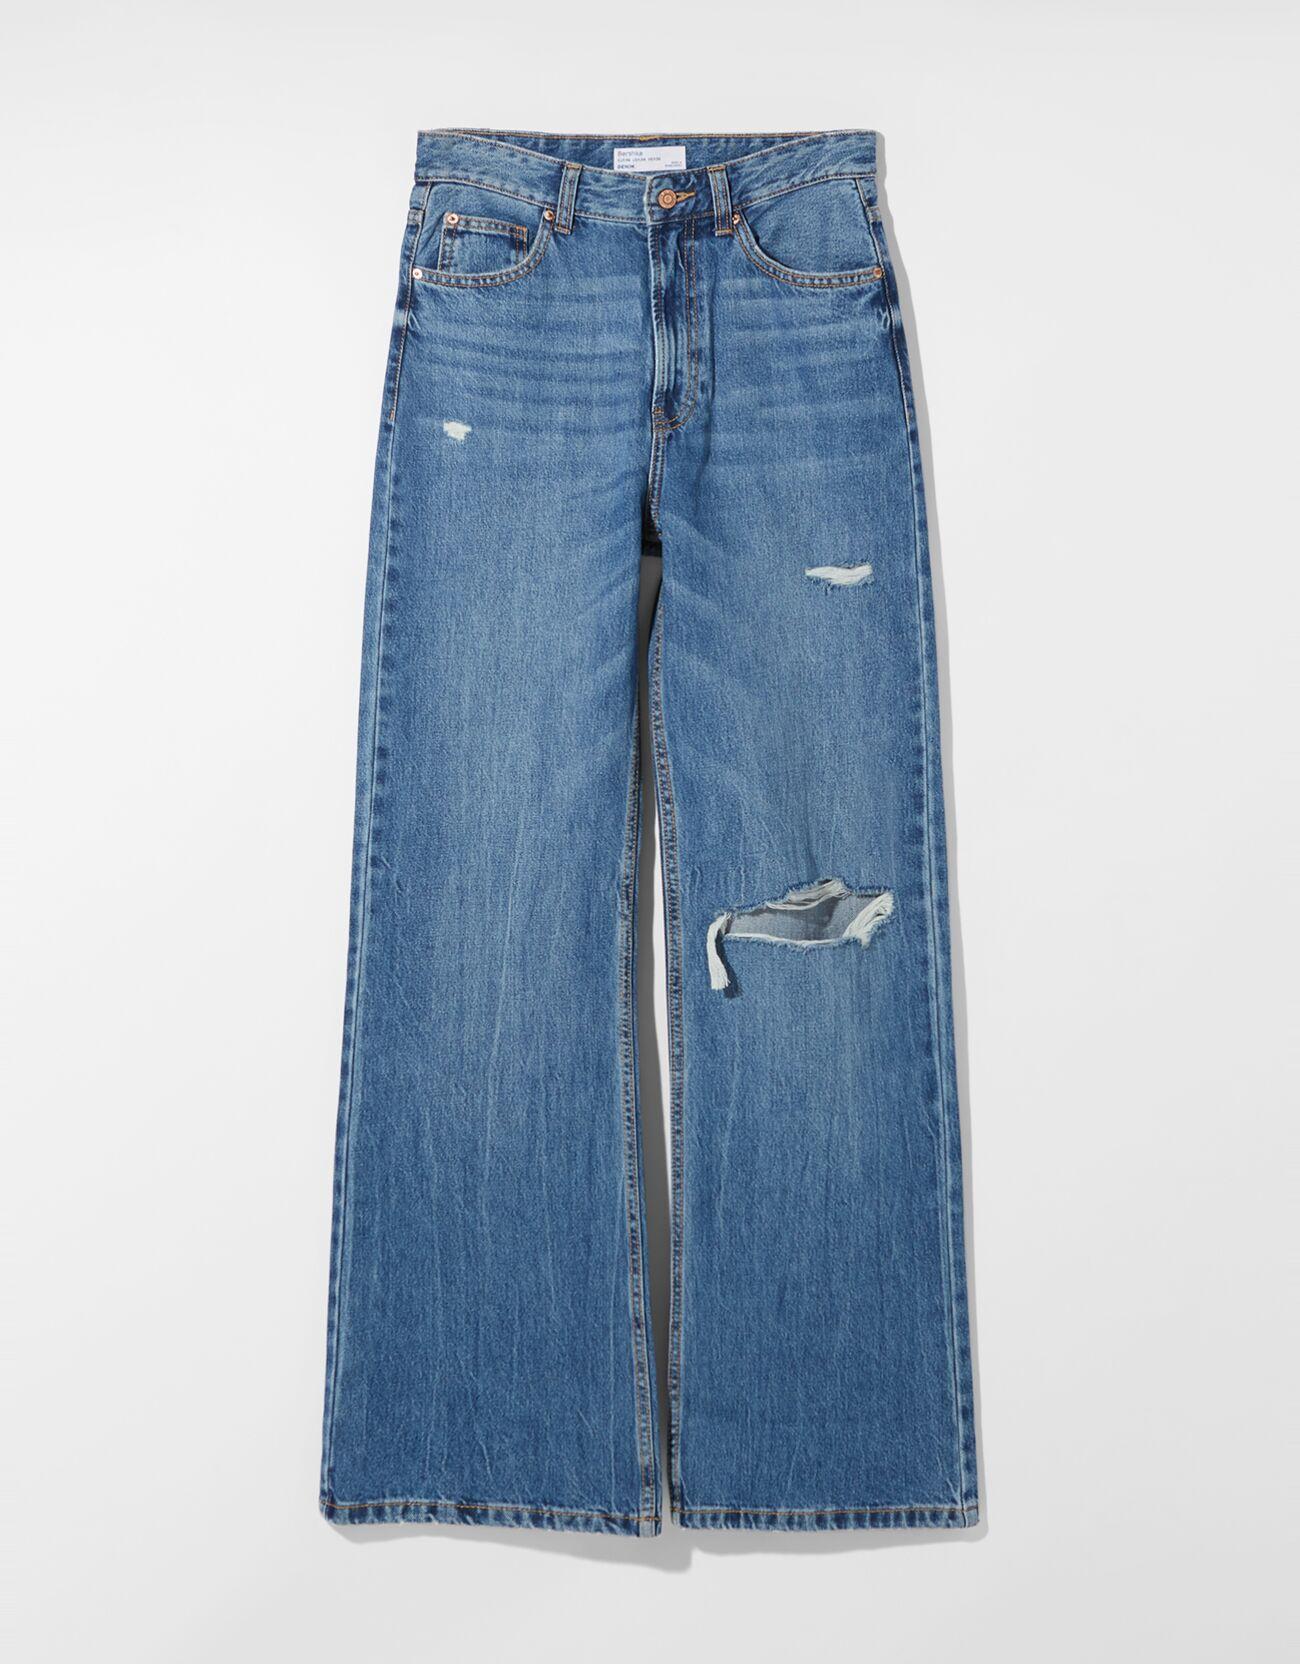 Jeans 90's rotos.